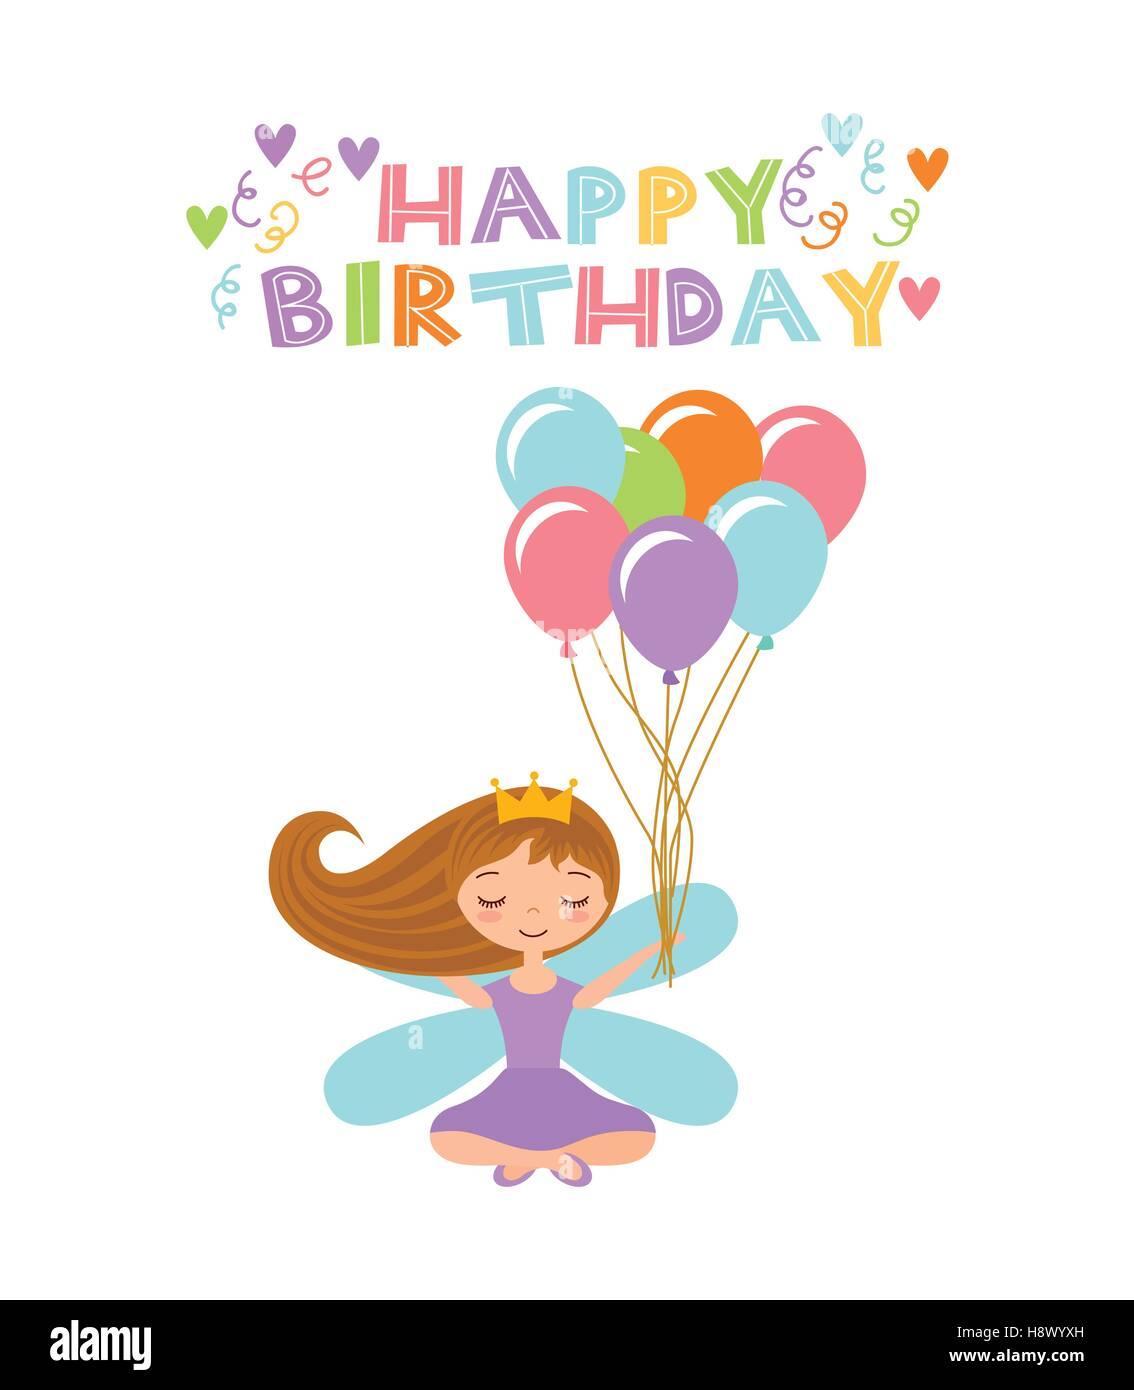 Happy Birthday Girl Illustration ~ Happy birthday card with cute fairy girl balloons icon over stock vector art illustration